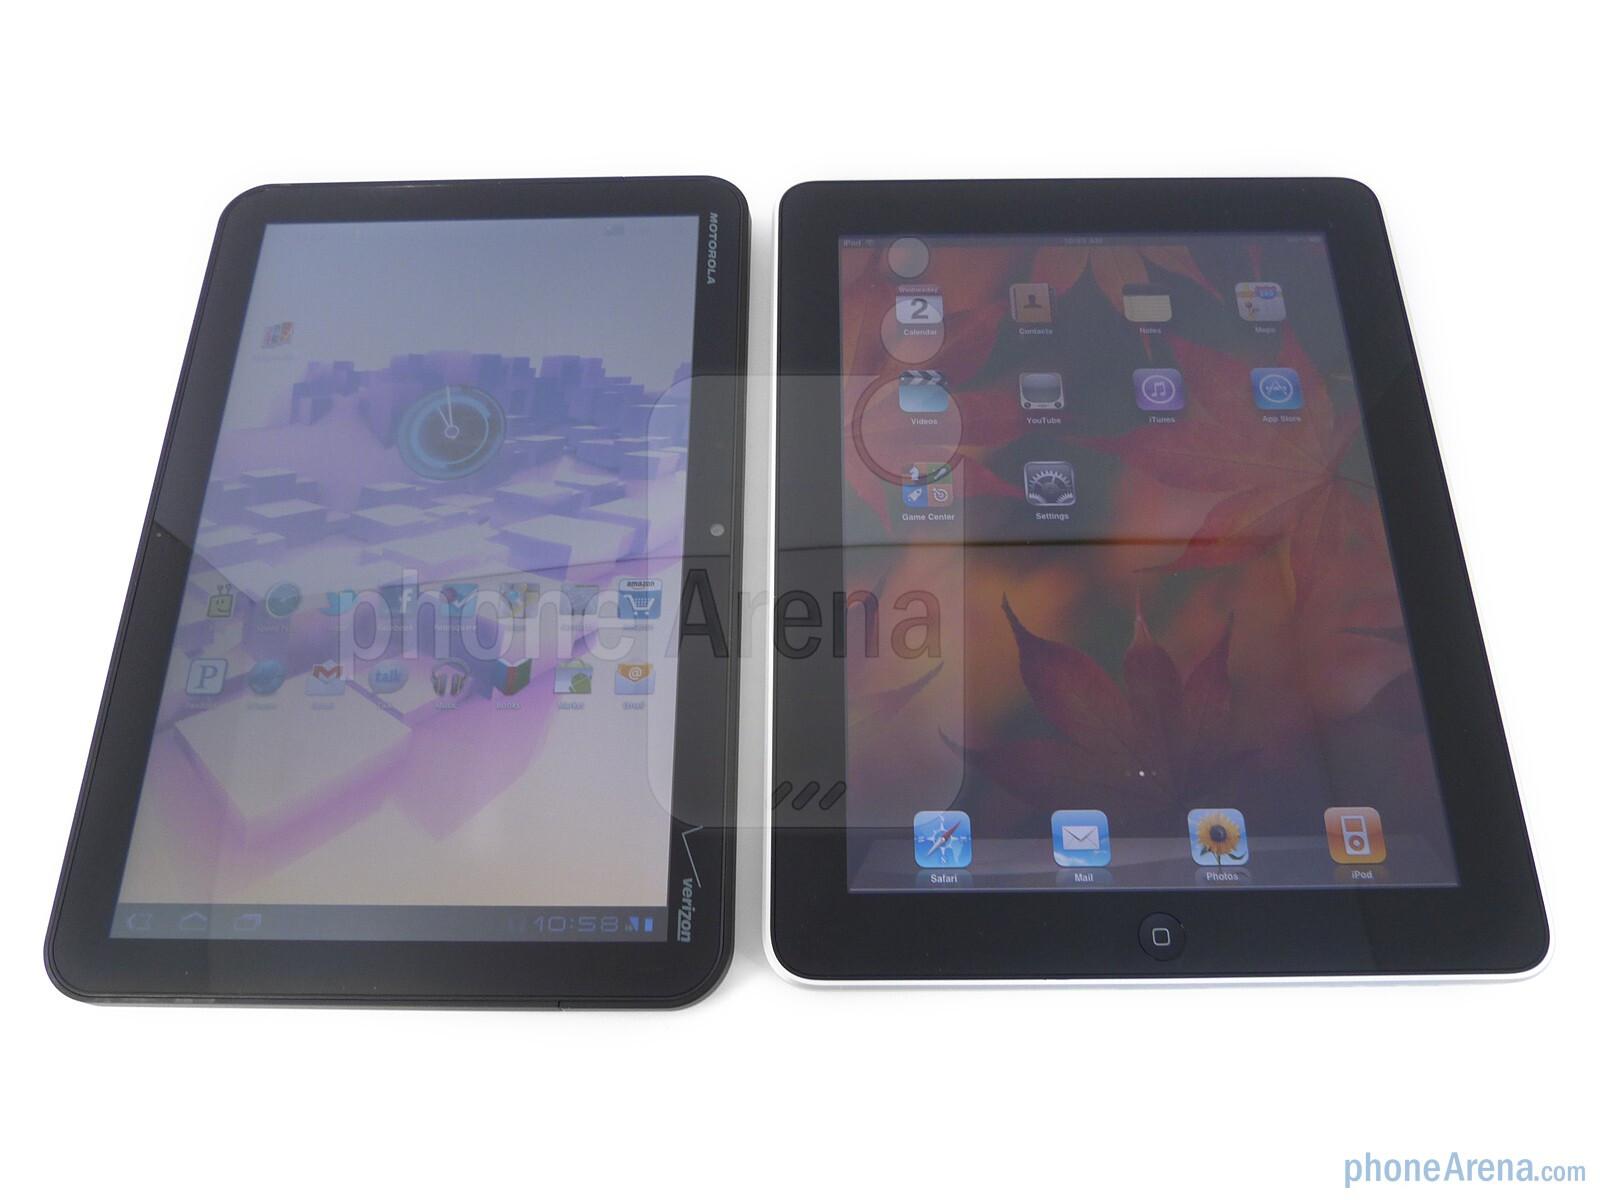 Motorola XOOM vs Apple iPad